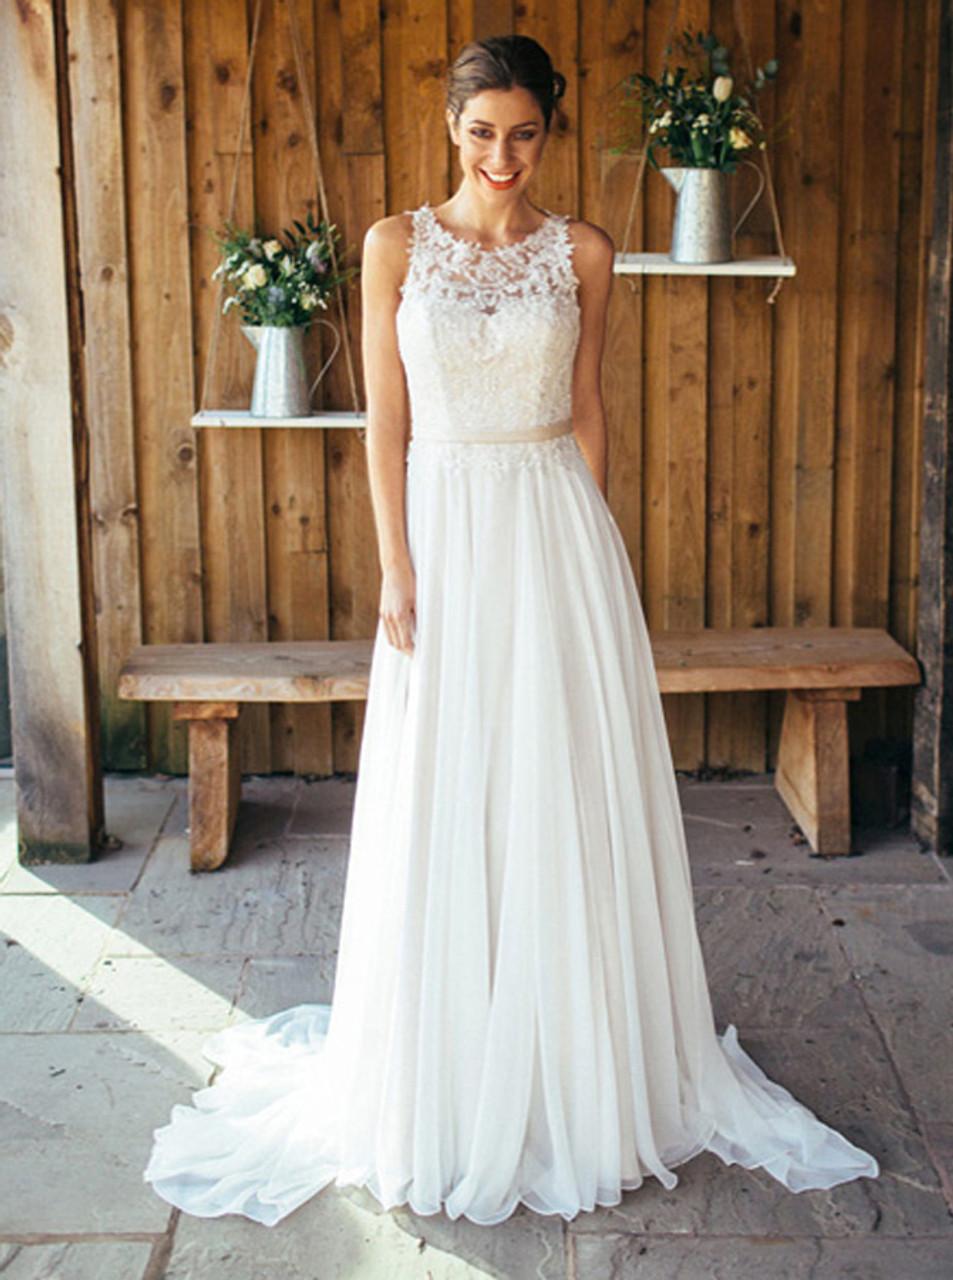 Light Flowy Beach Wedding Dresses Goldin Ma,Lily Allen Wedding Dress David Harbour